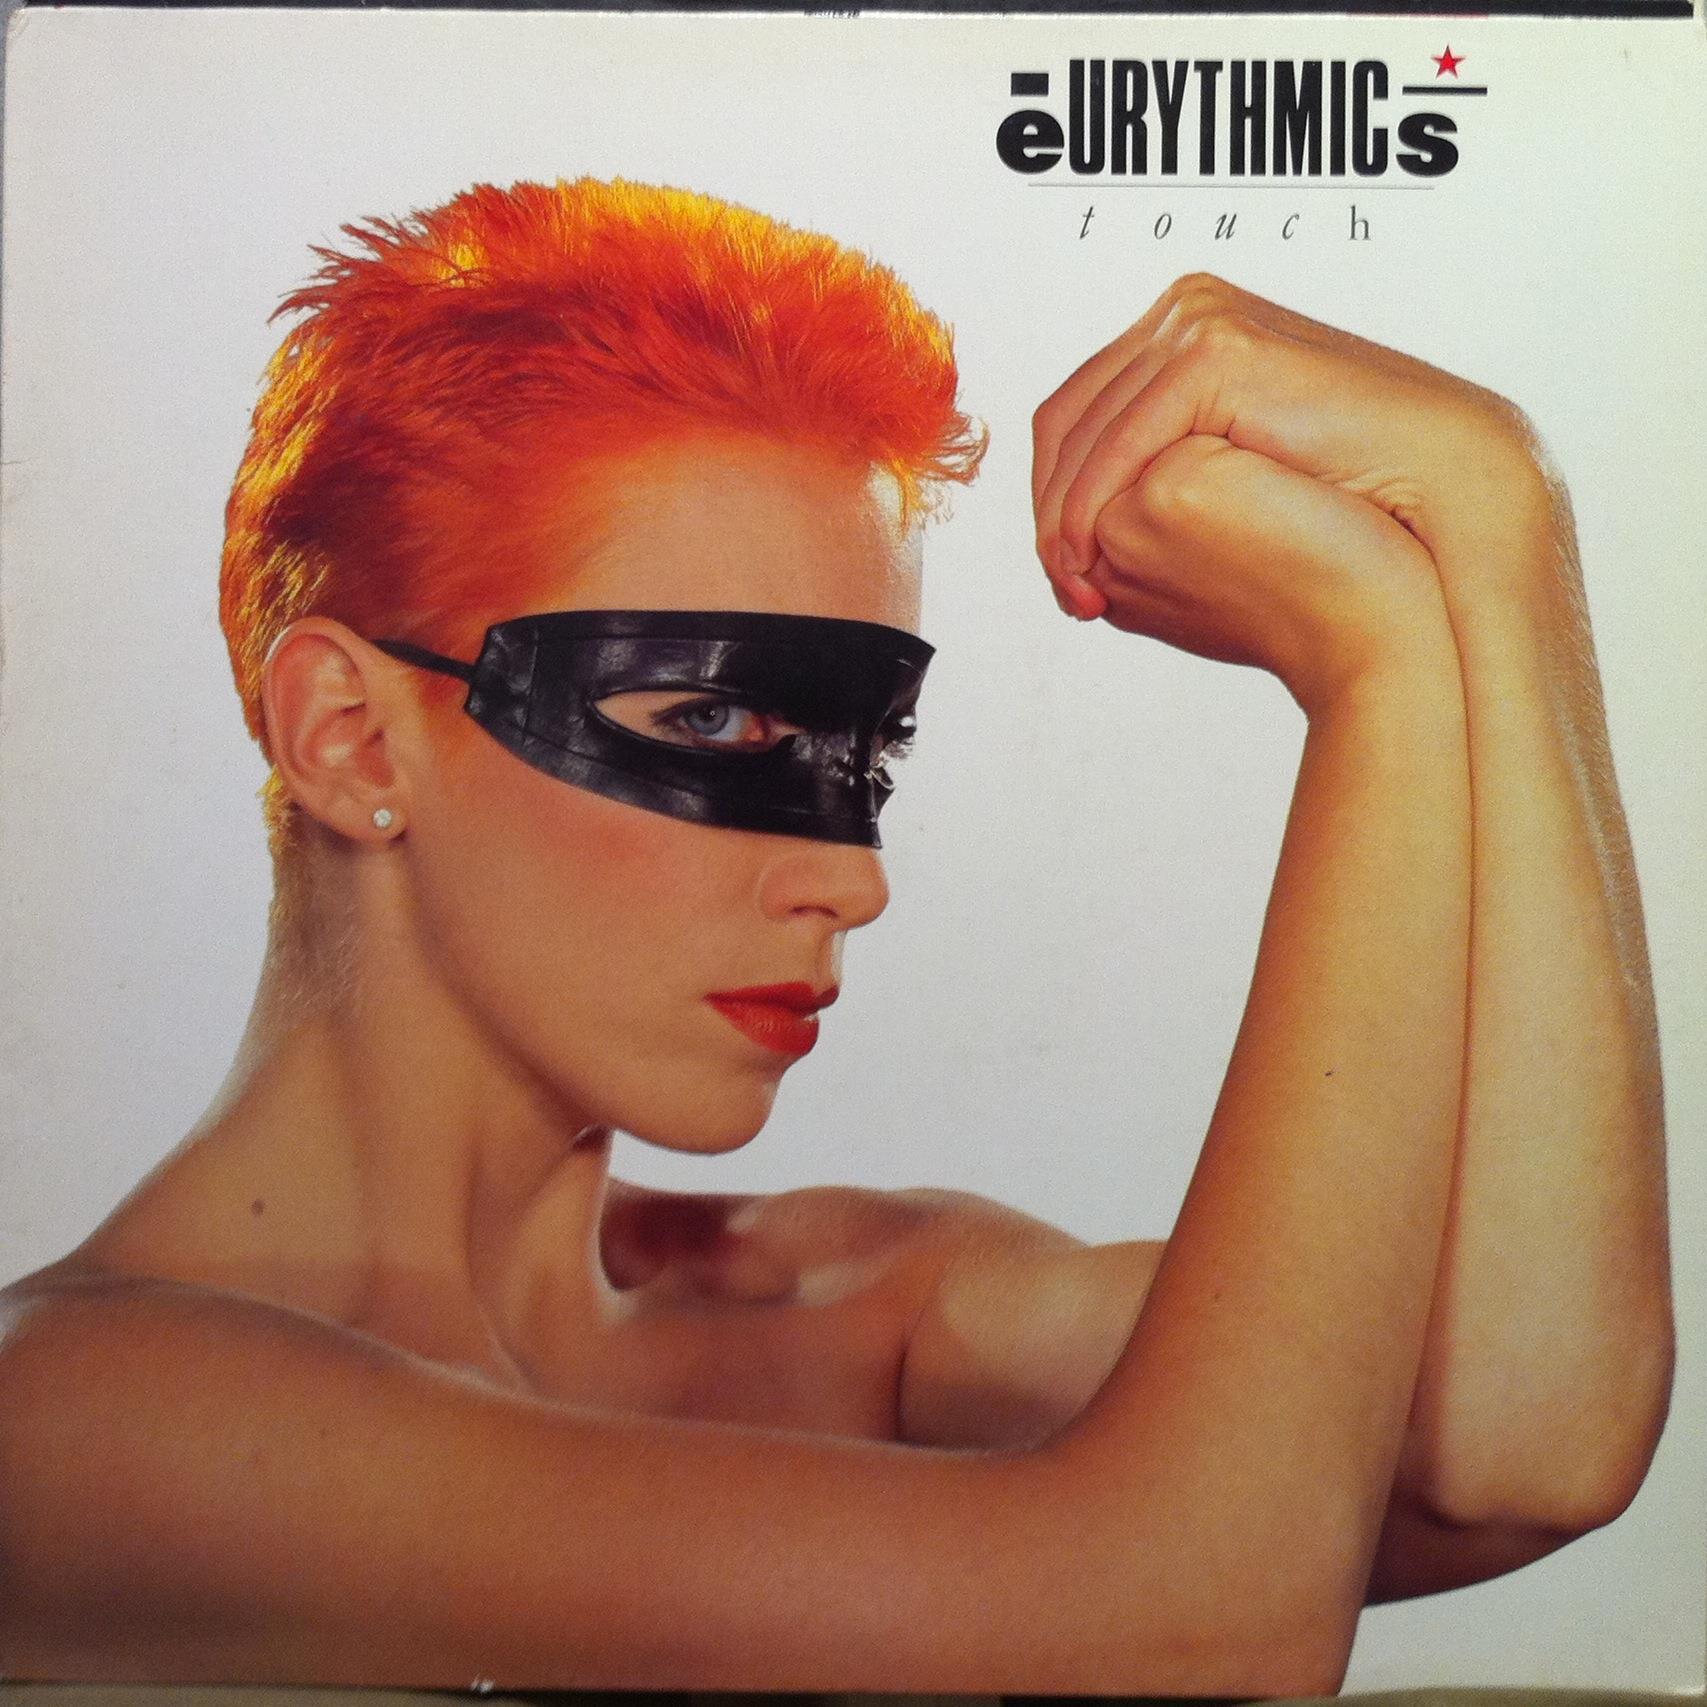 EURYTHMICS - Eurythmics Touch Lp Vg+ Pl 70109 Vinyl 1983 Record (touch)